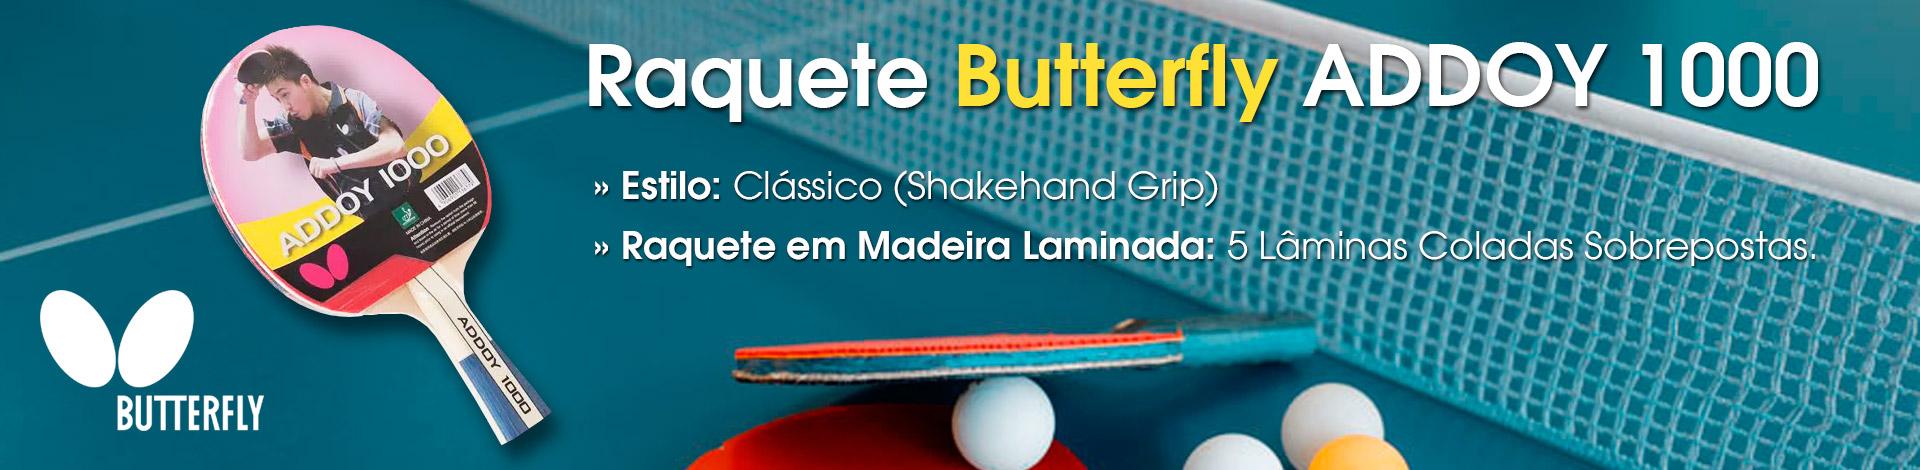 raquetes de tenis de mesa butterfly